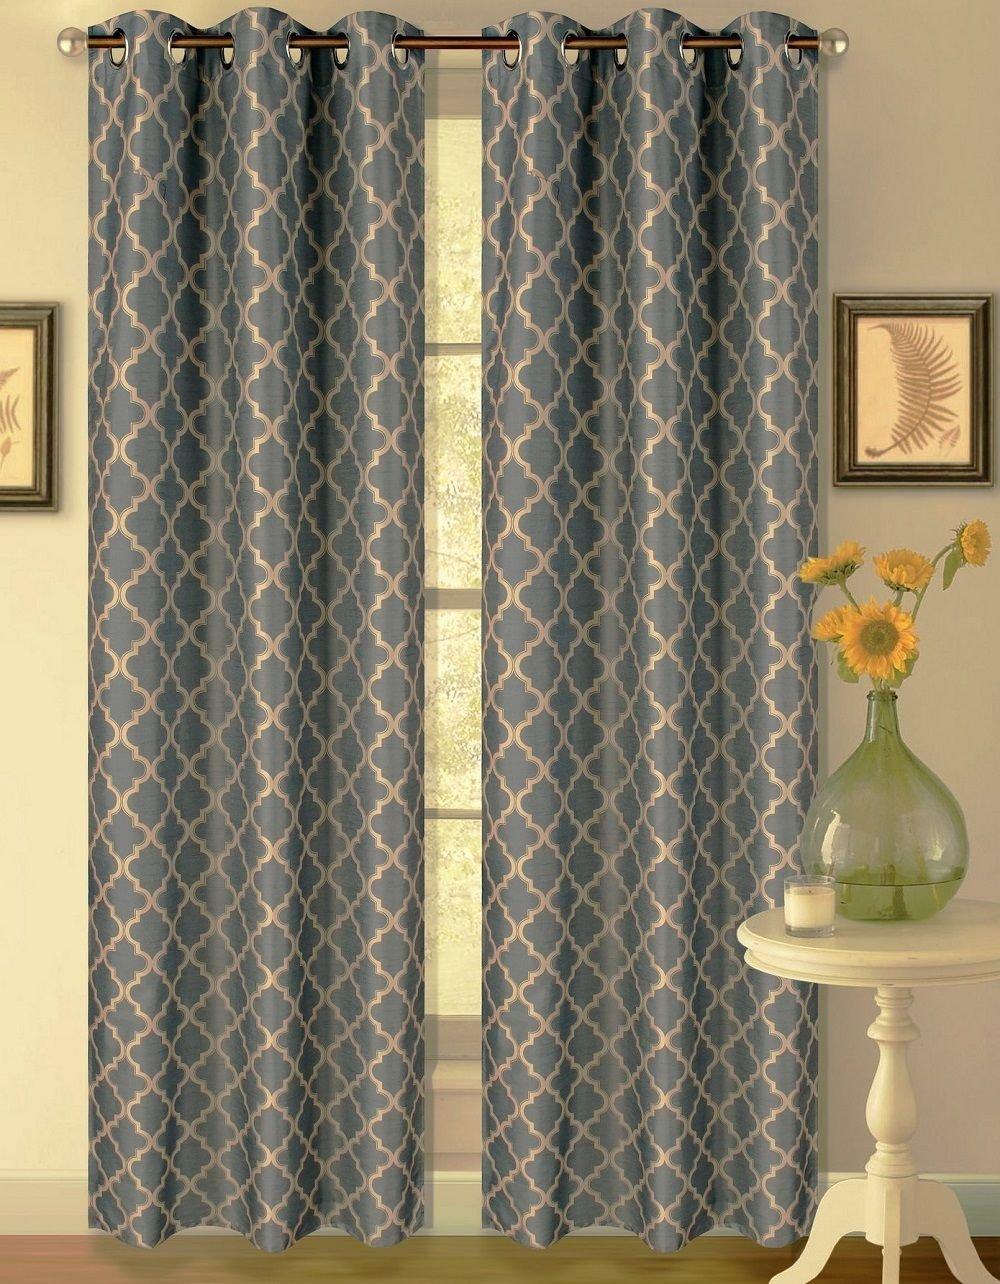 1 Set Slate Taupe 108'' Geometric Lined Blackout Grommet Window Drape Curtain